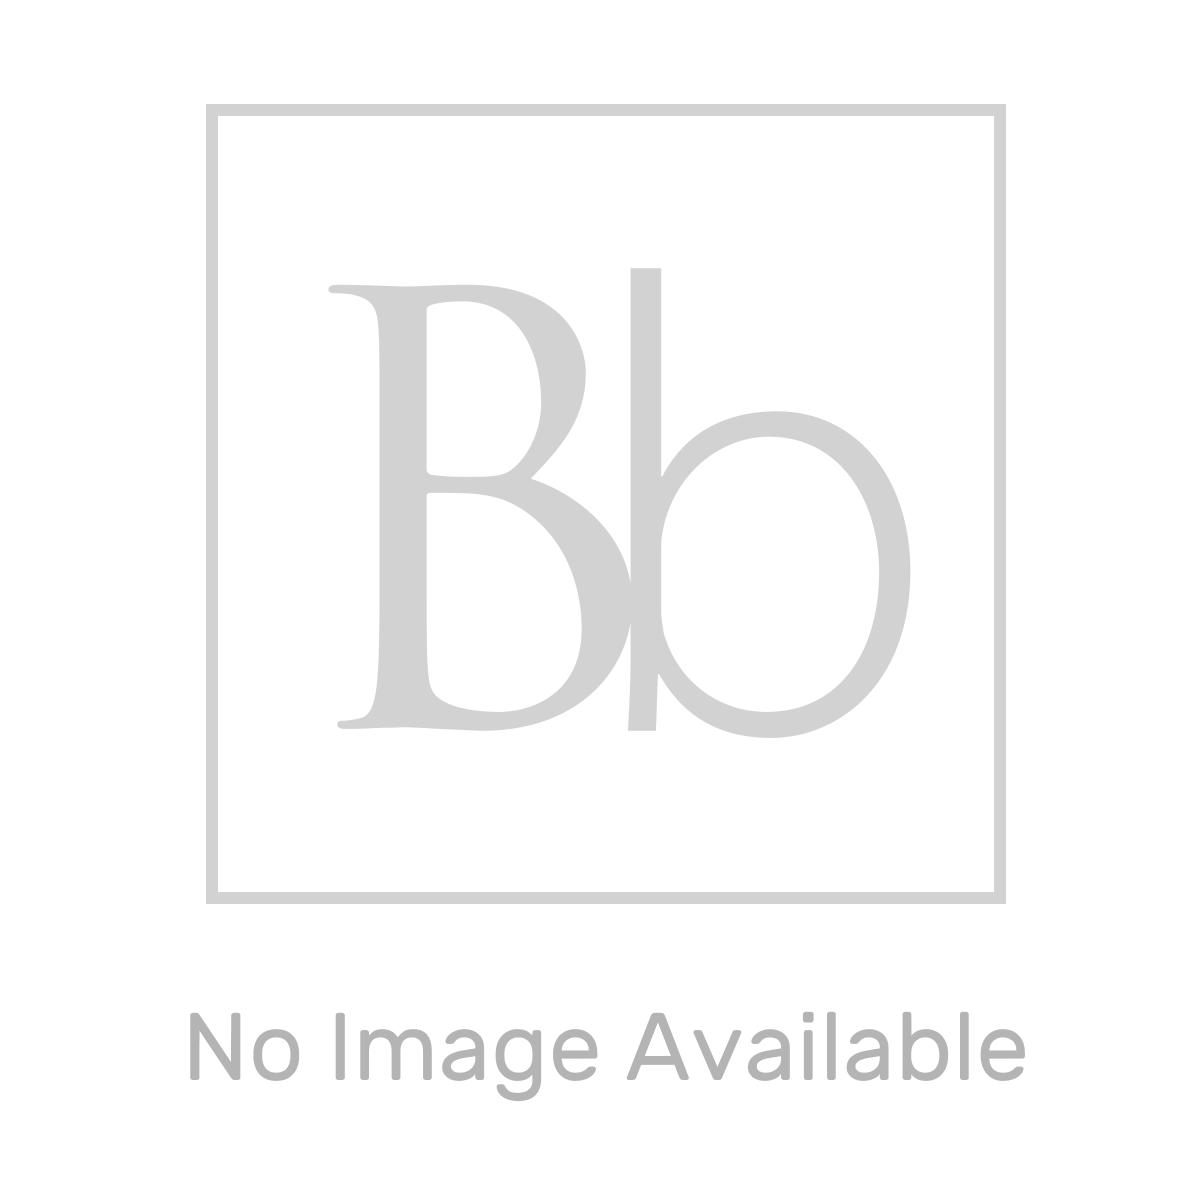 Premier Chrome Square Ladder Towel Rail Lifestyle